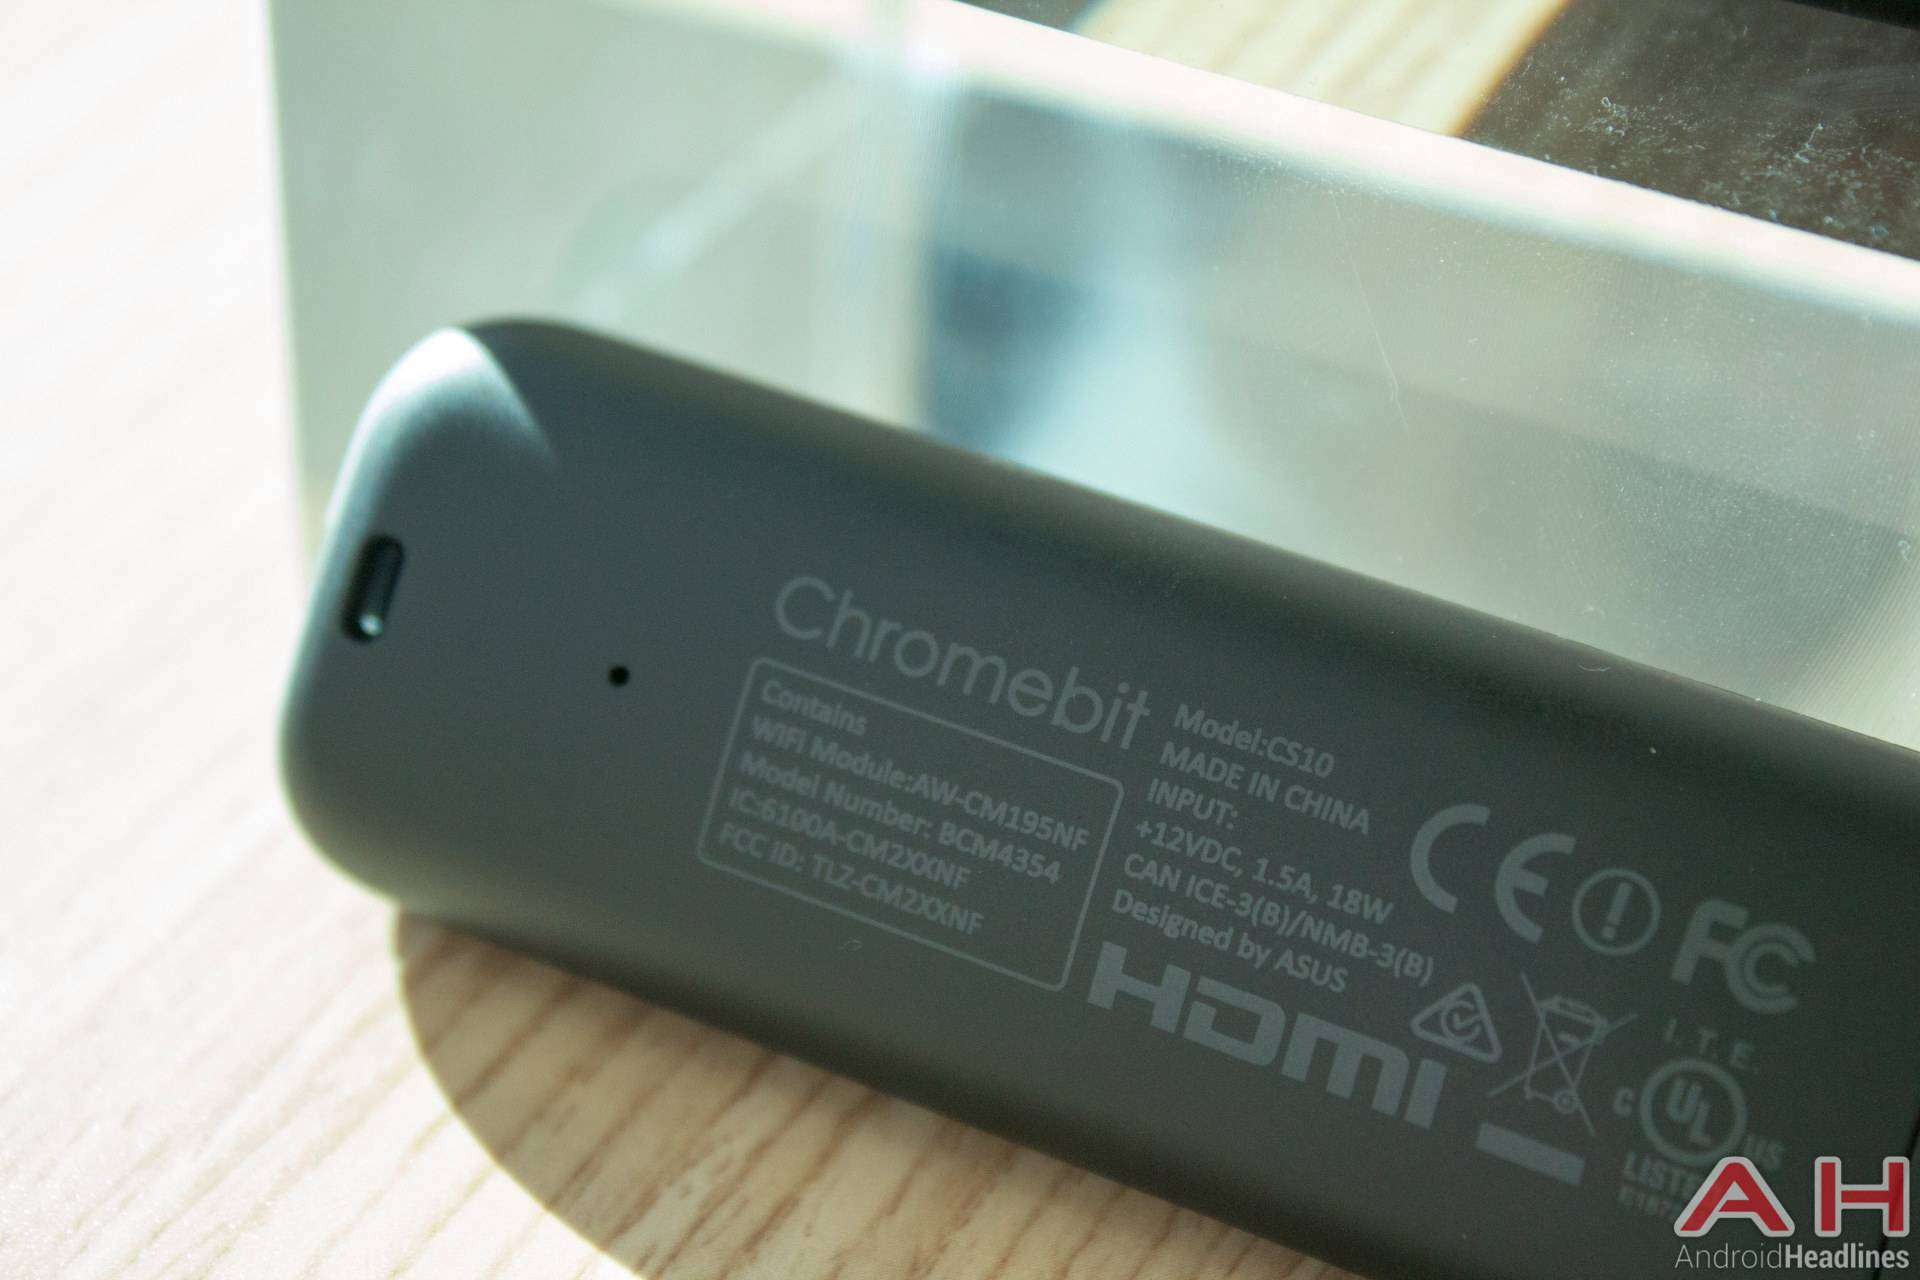 AH ASUS Chromebit 7